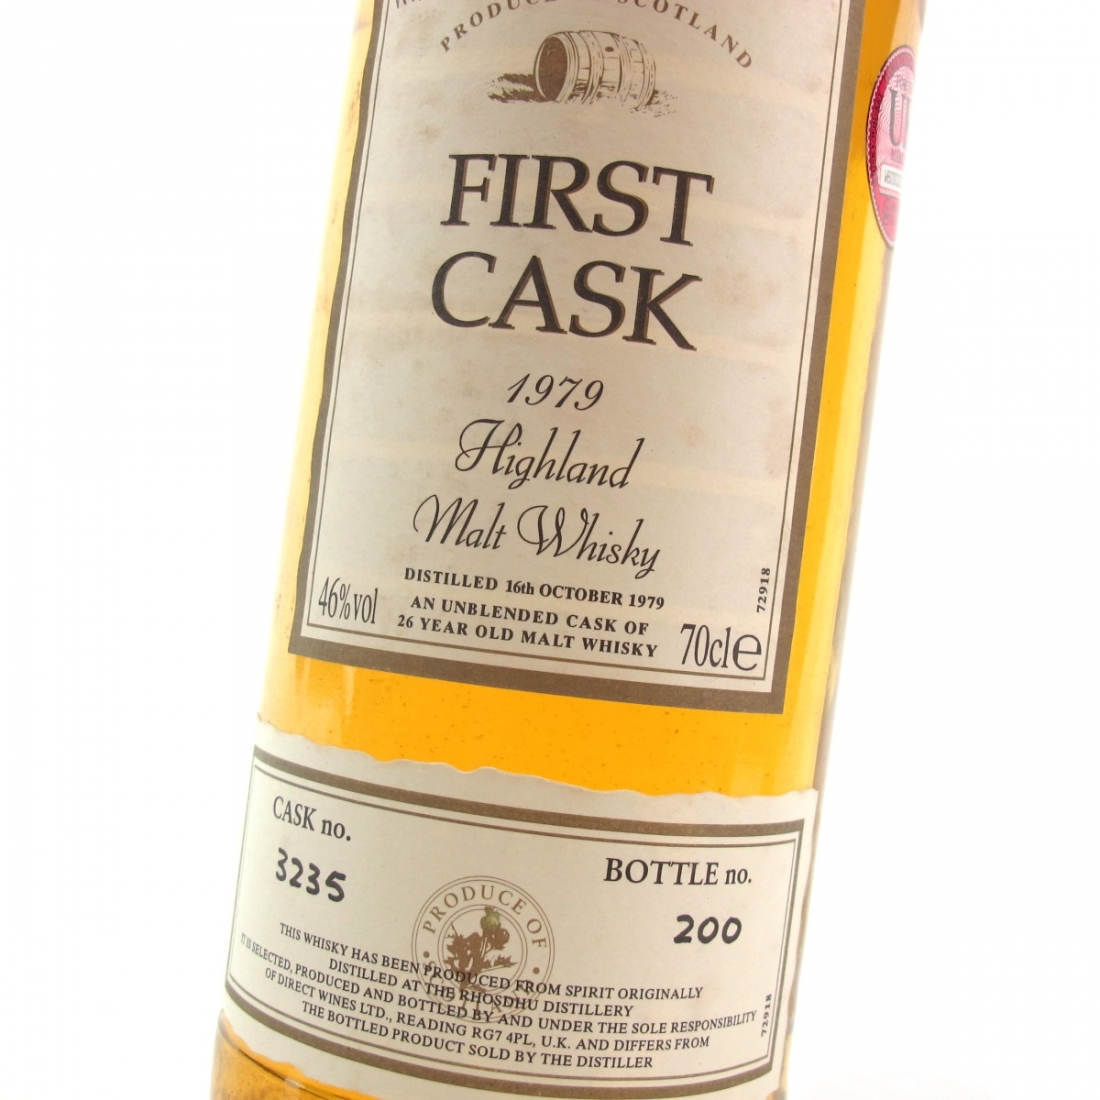 Loch Lomond / Rhosdhu 1979 First Cask 26 Year Old